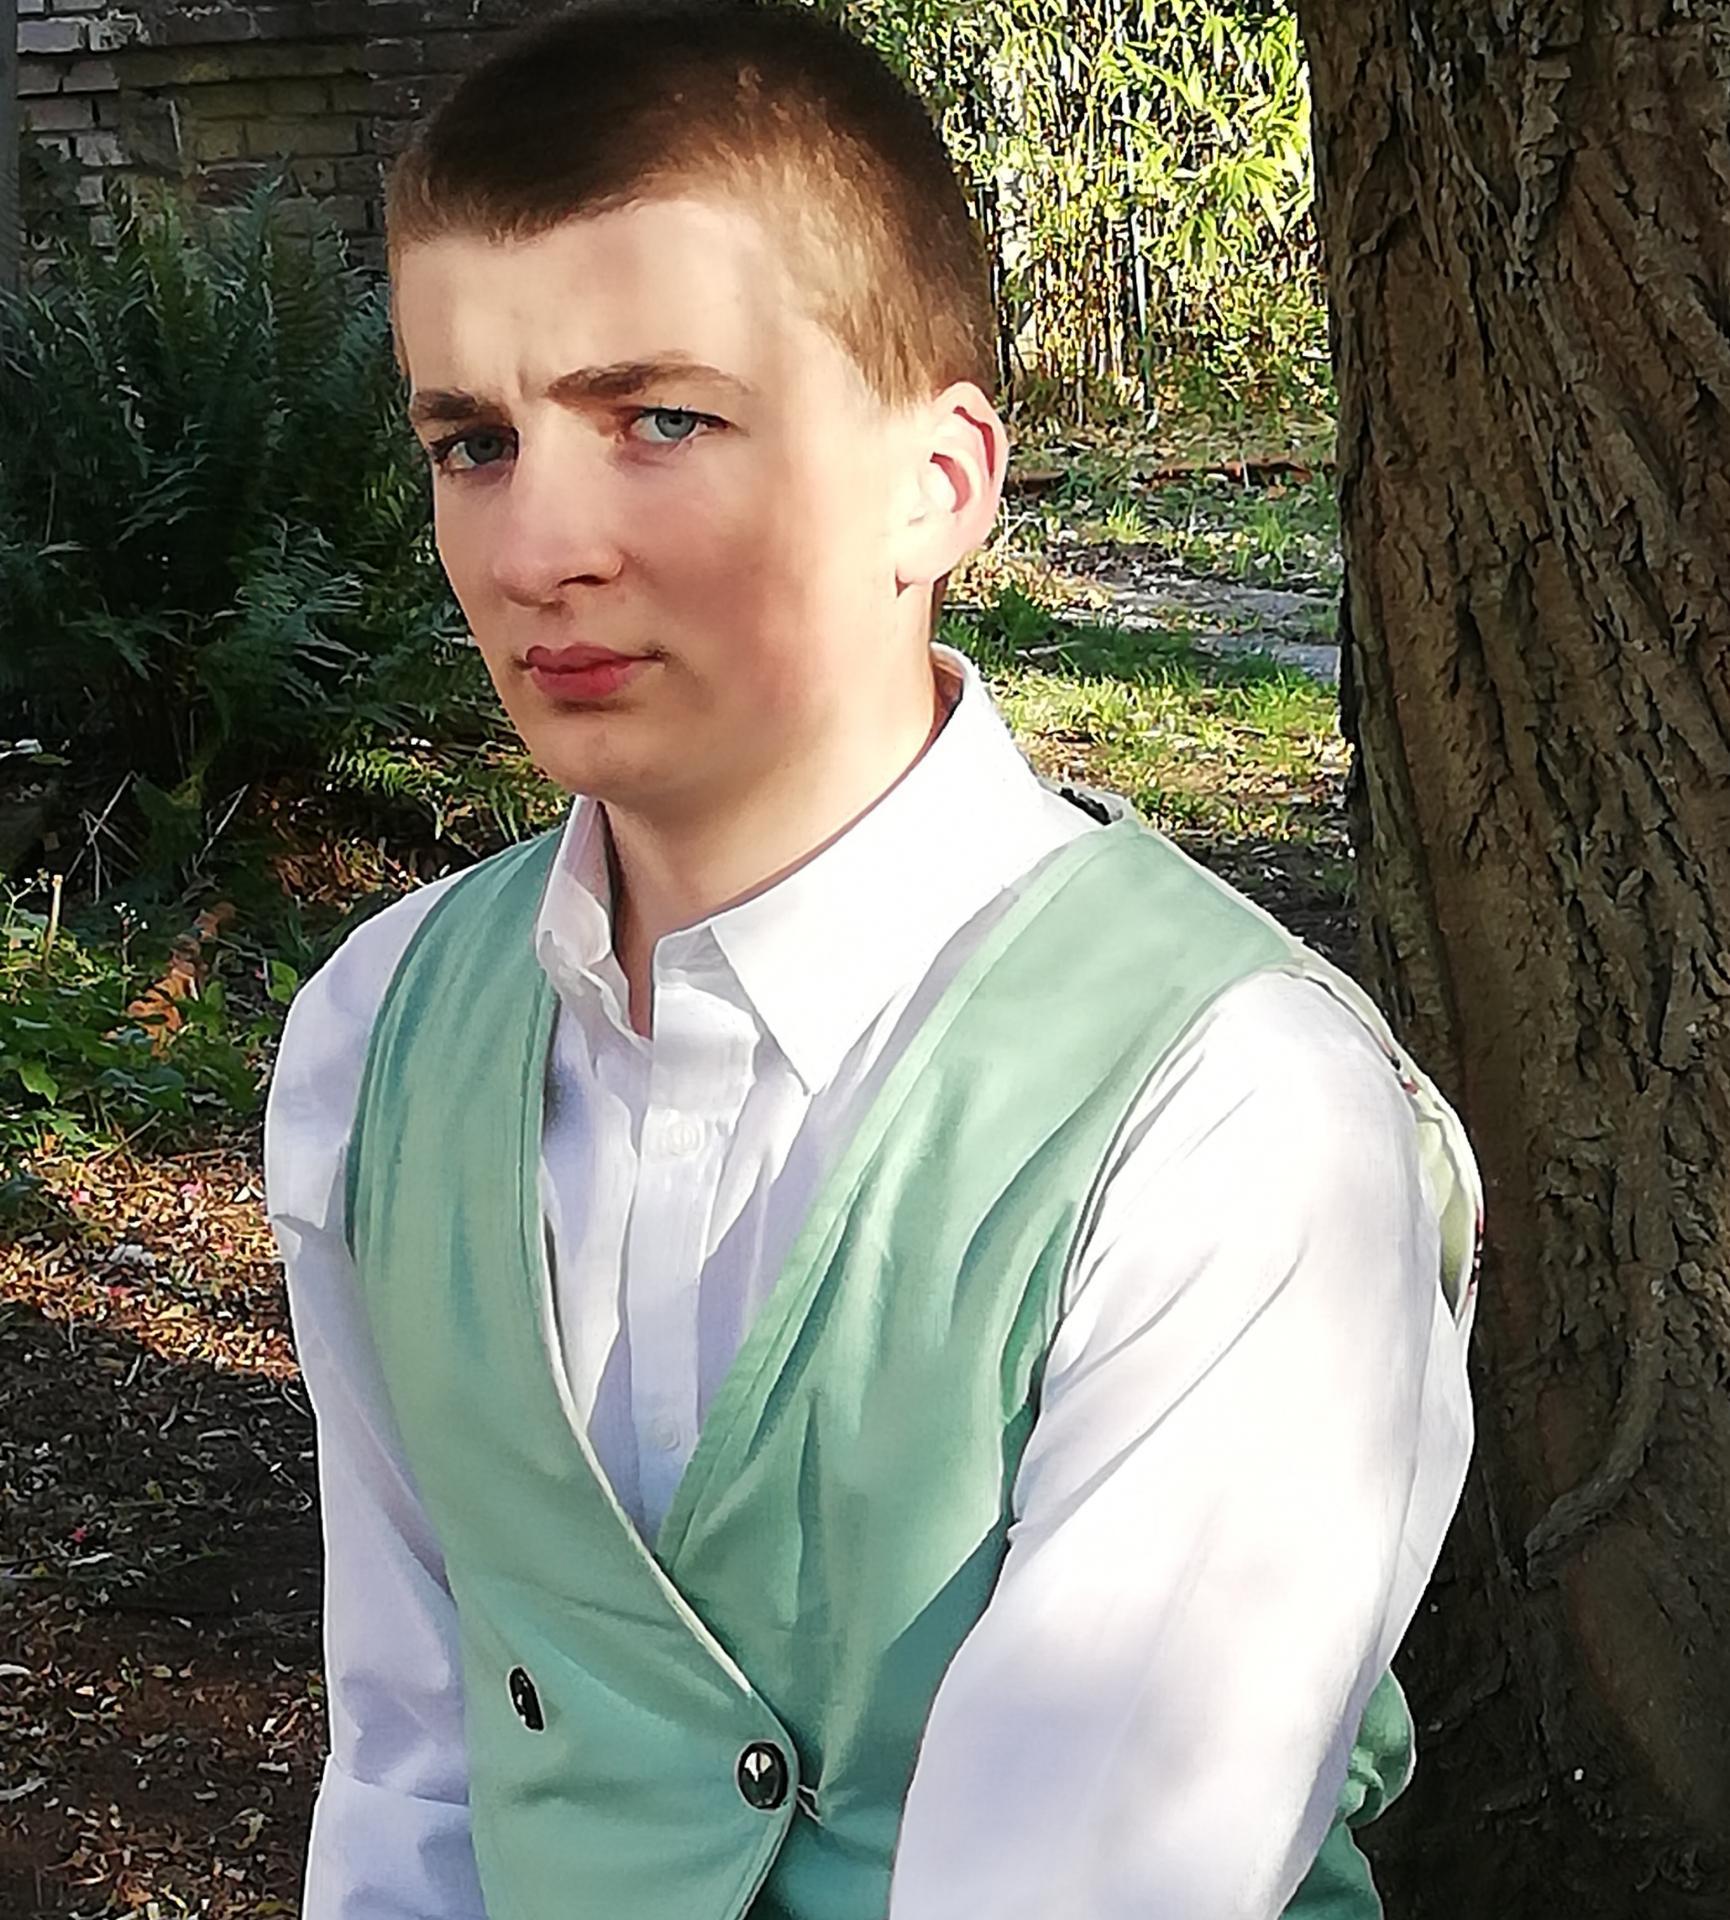 Gilet british reversible l elegant vert homme fifi au jardin pose 3